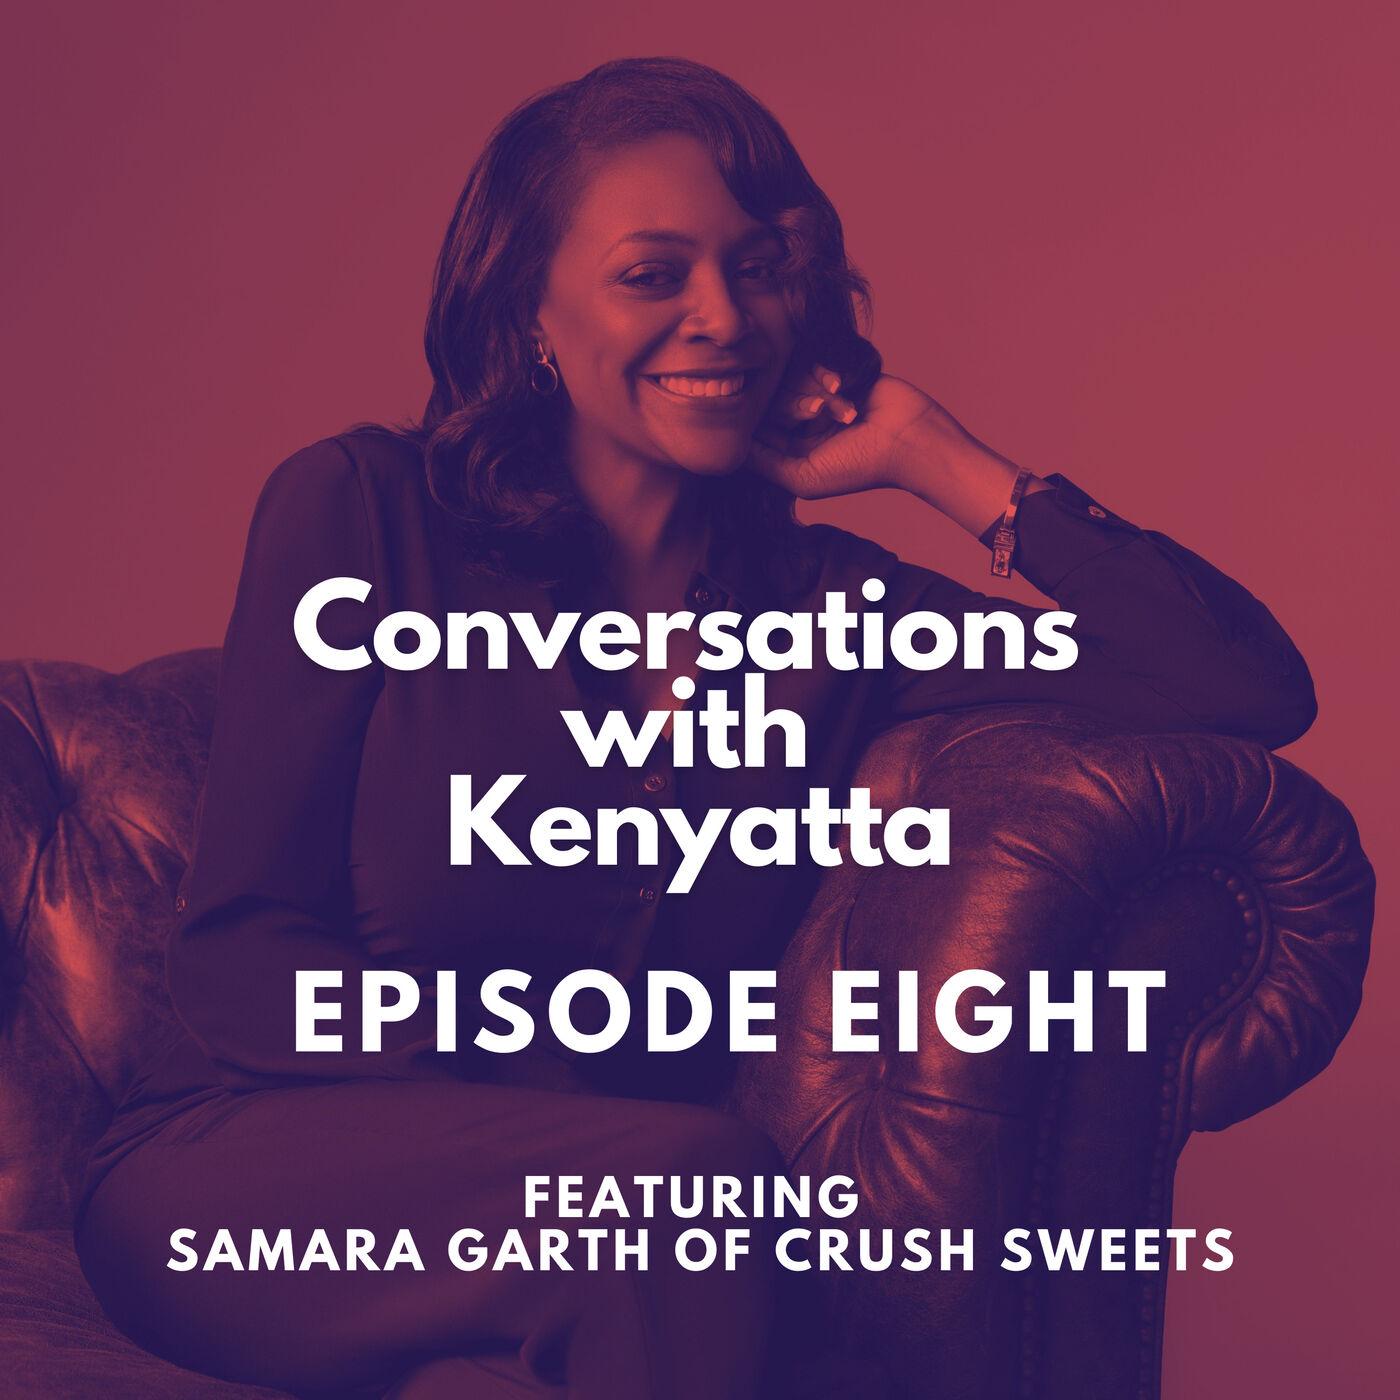 A Conversation with Samara Garth of Crush Sweets